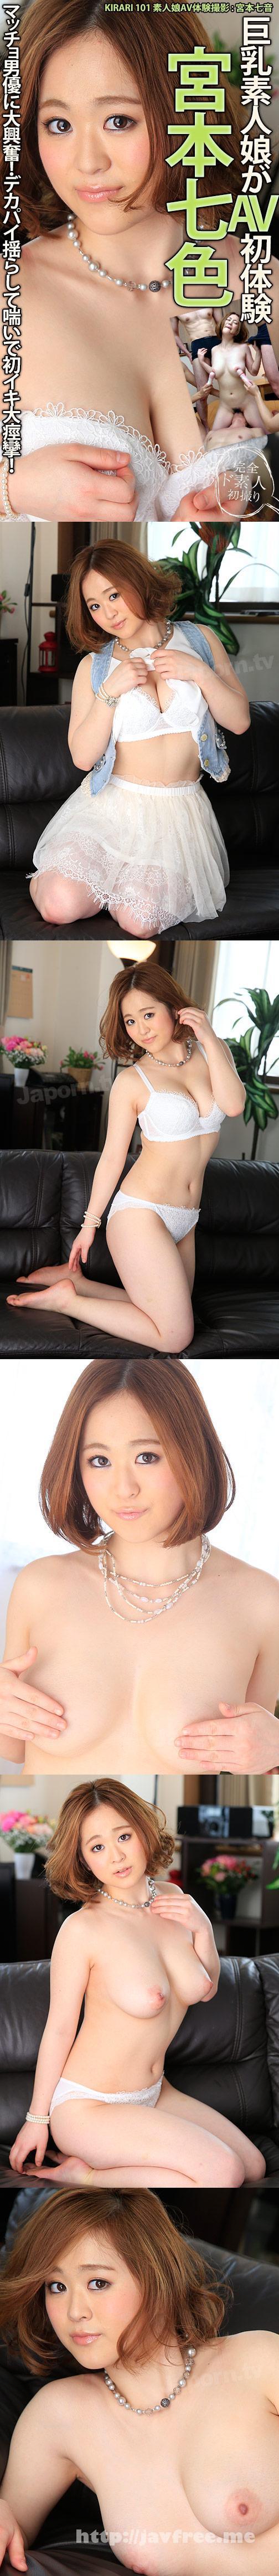 [MKD S101] KIRARI 101 素人娘AV体験撮影 : 宮本七音 宮本七音 MKD Doremi Miyamoto